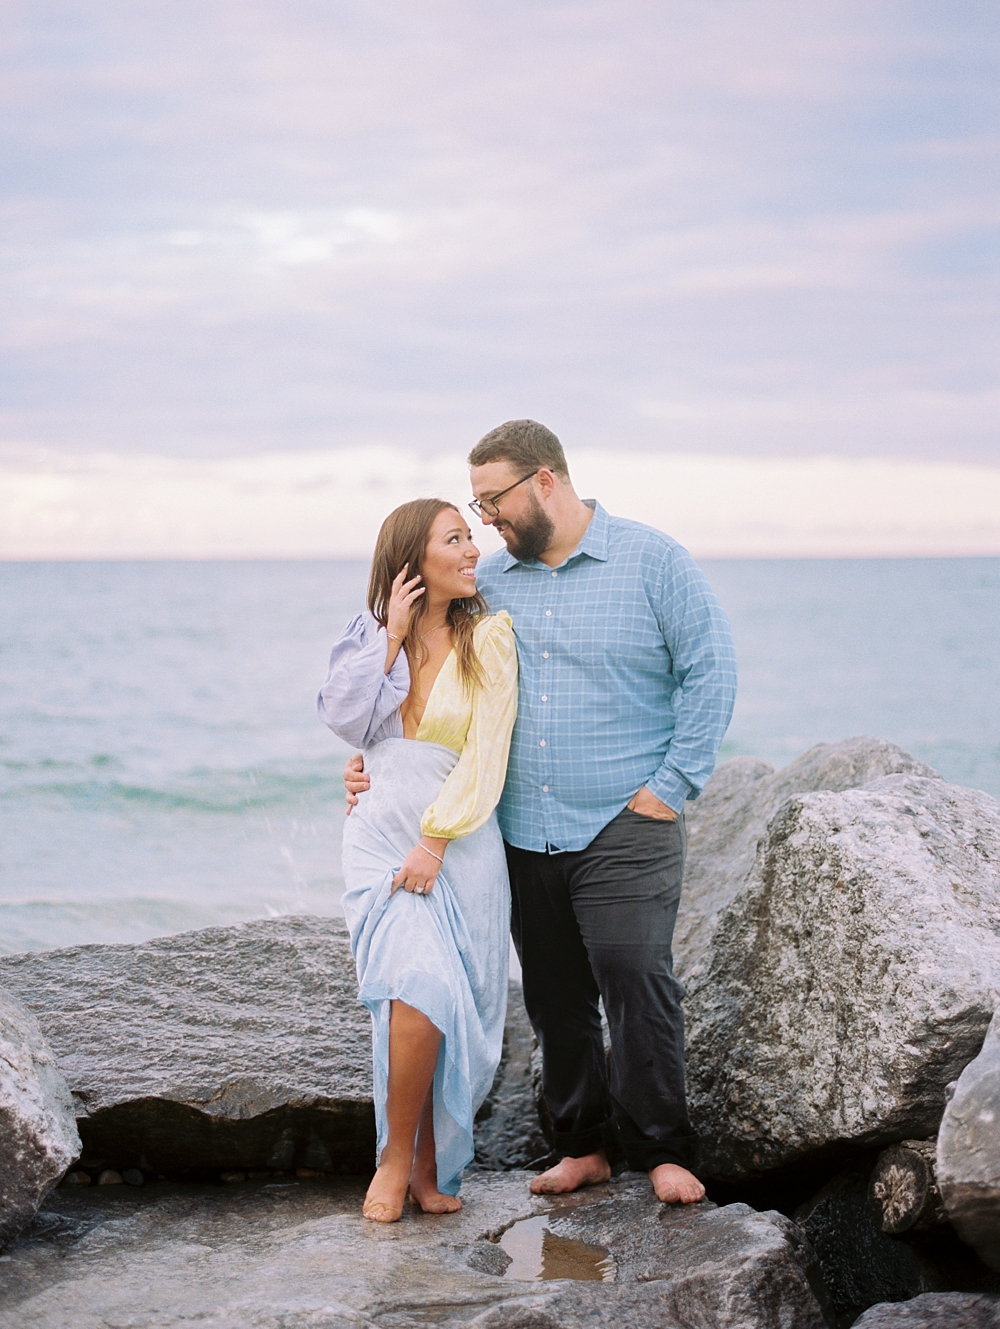 kristin-la-voie-photography-Chicago-Engagement-glencoe-beach-lake-michigan-1